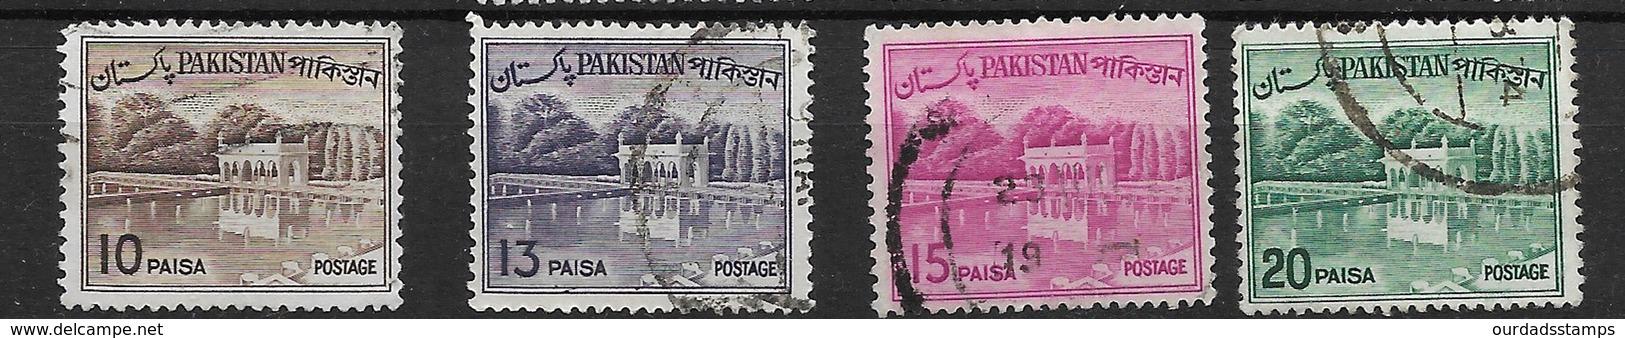 Pakistan 1962 Khyber Pass/Shalimar Gardens, Bengali Inscription, Used (5068) - Pakistan